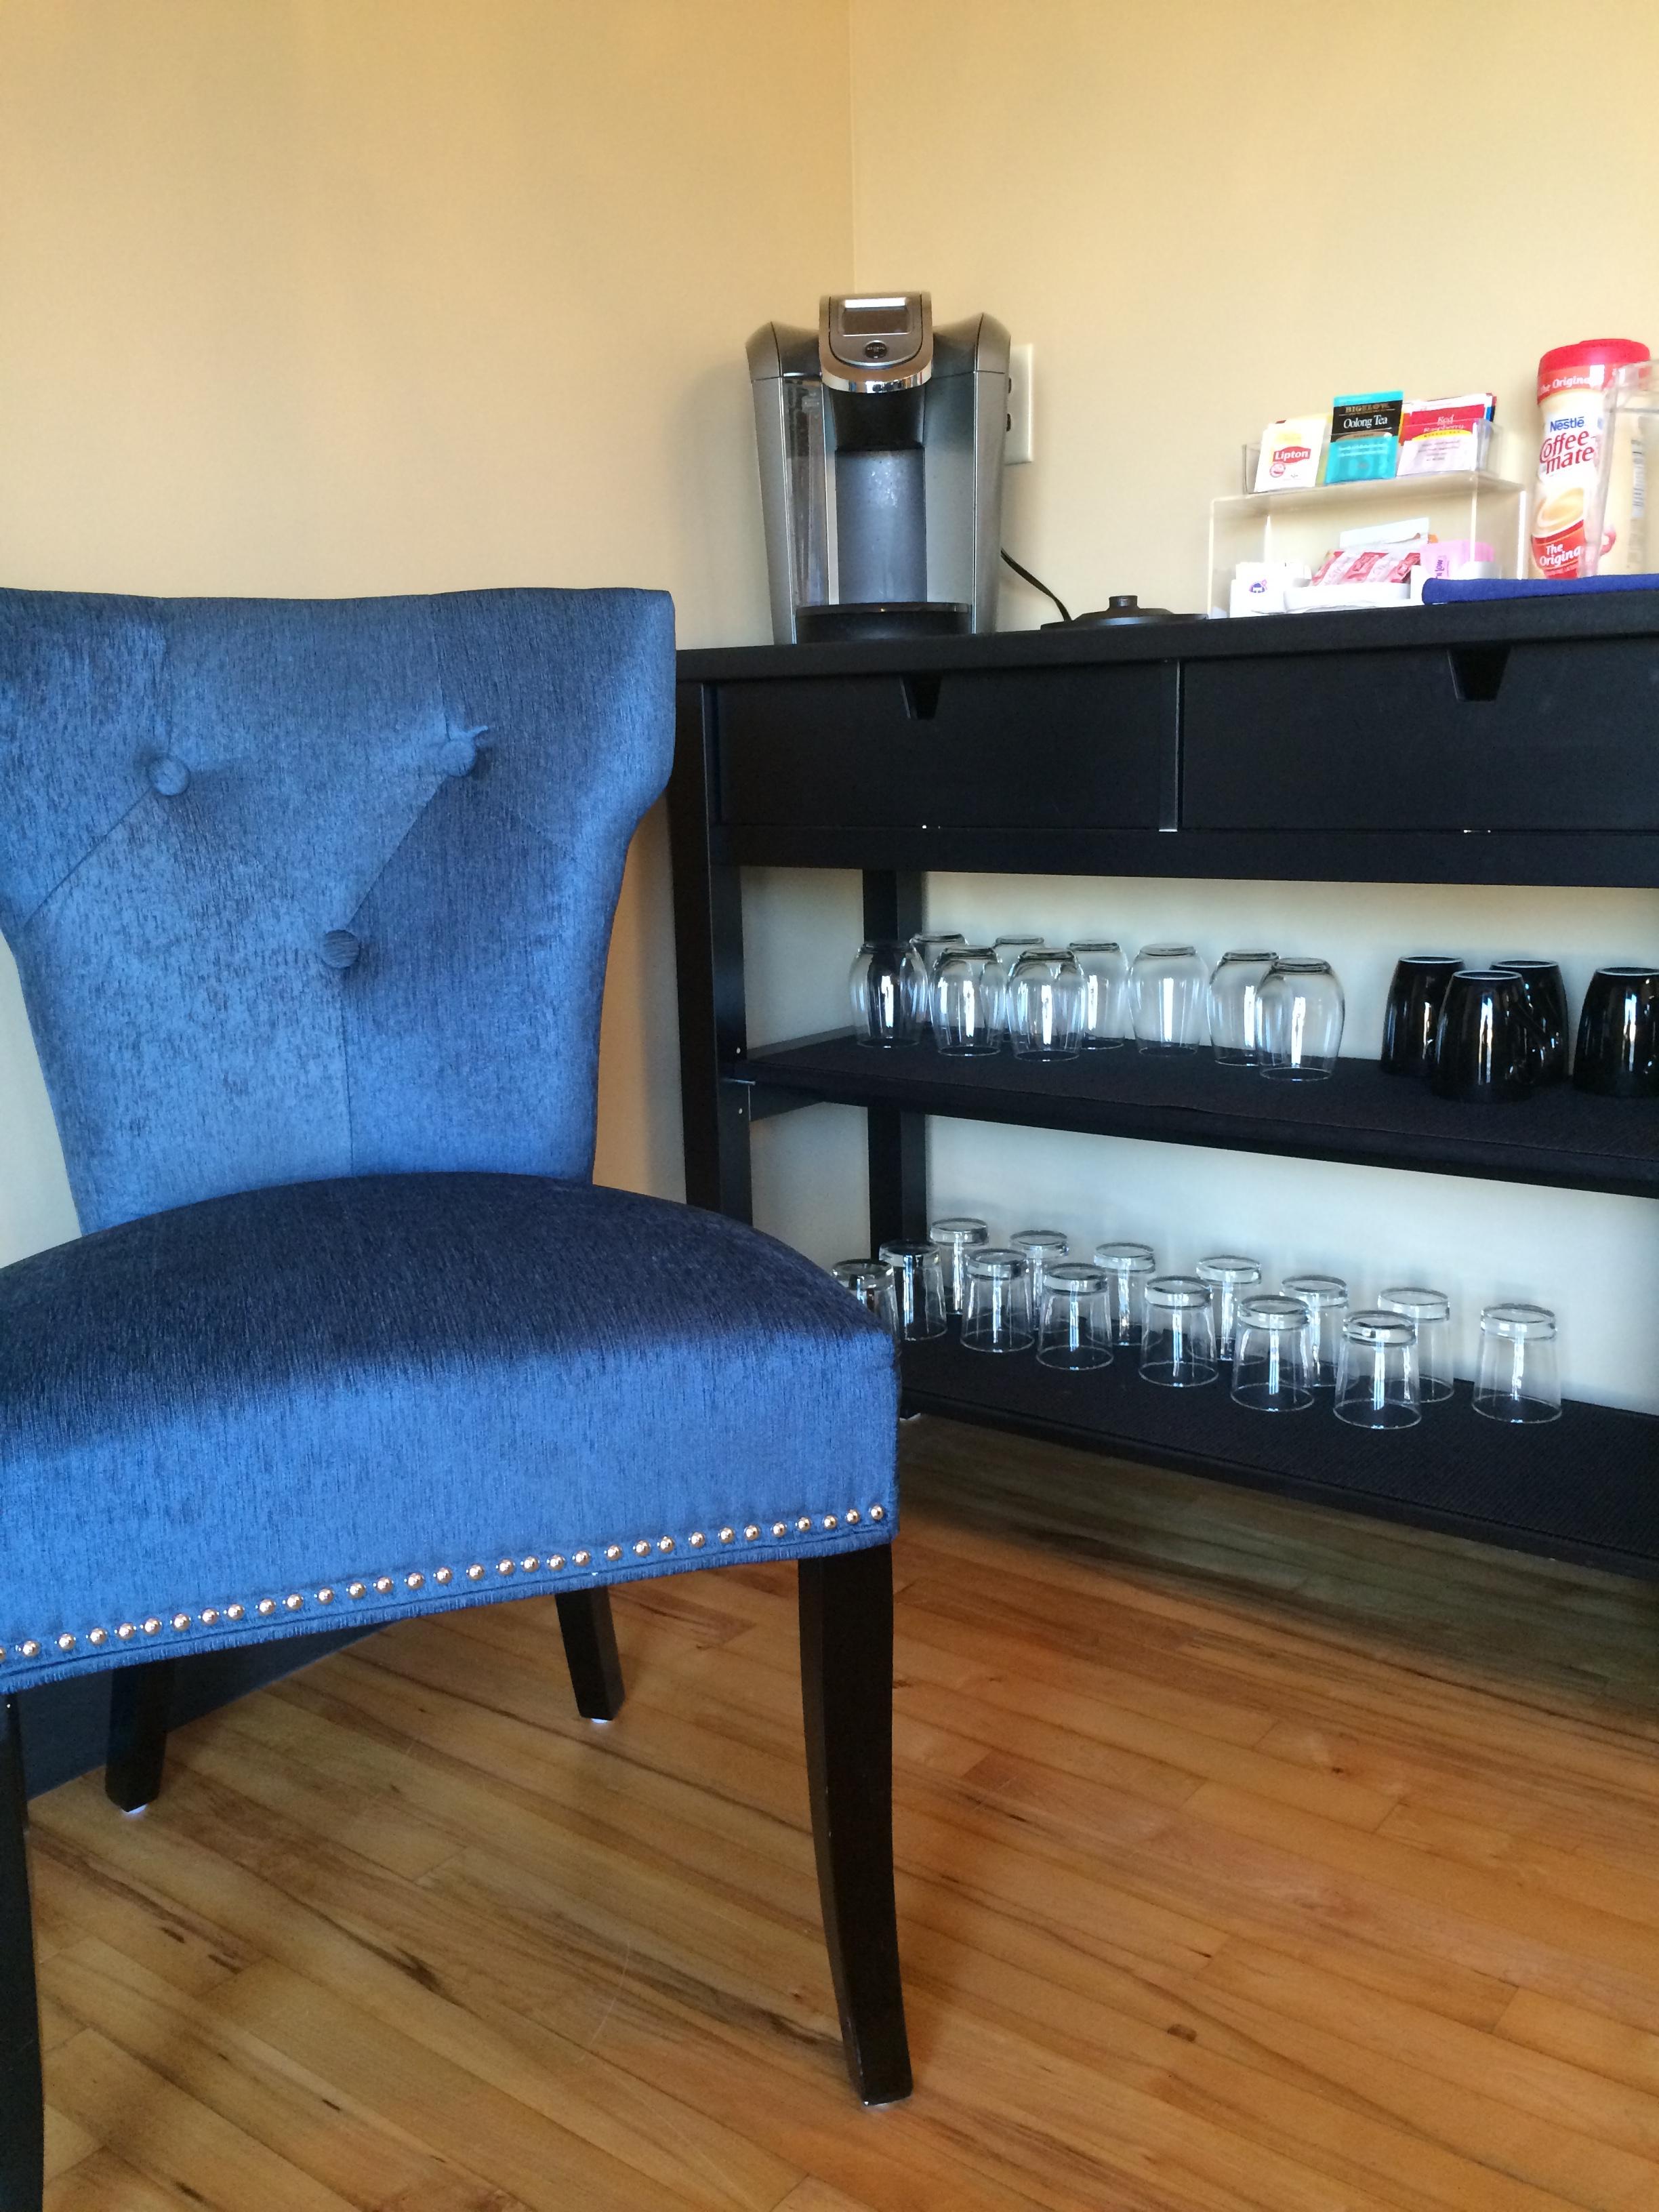 salon waiting area beverage station